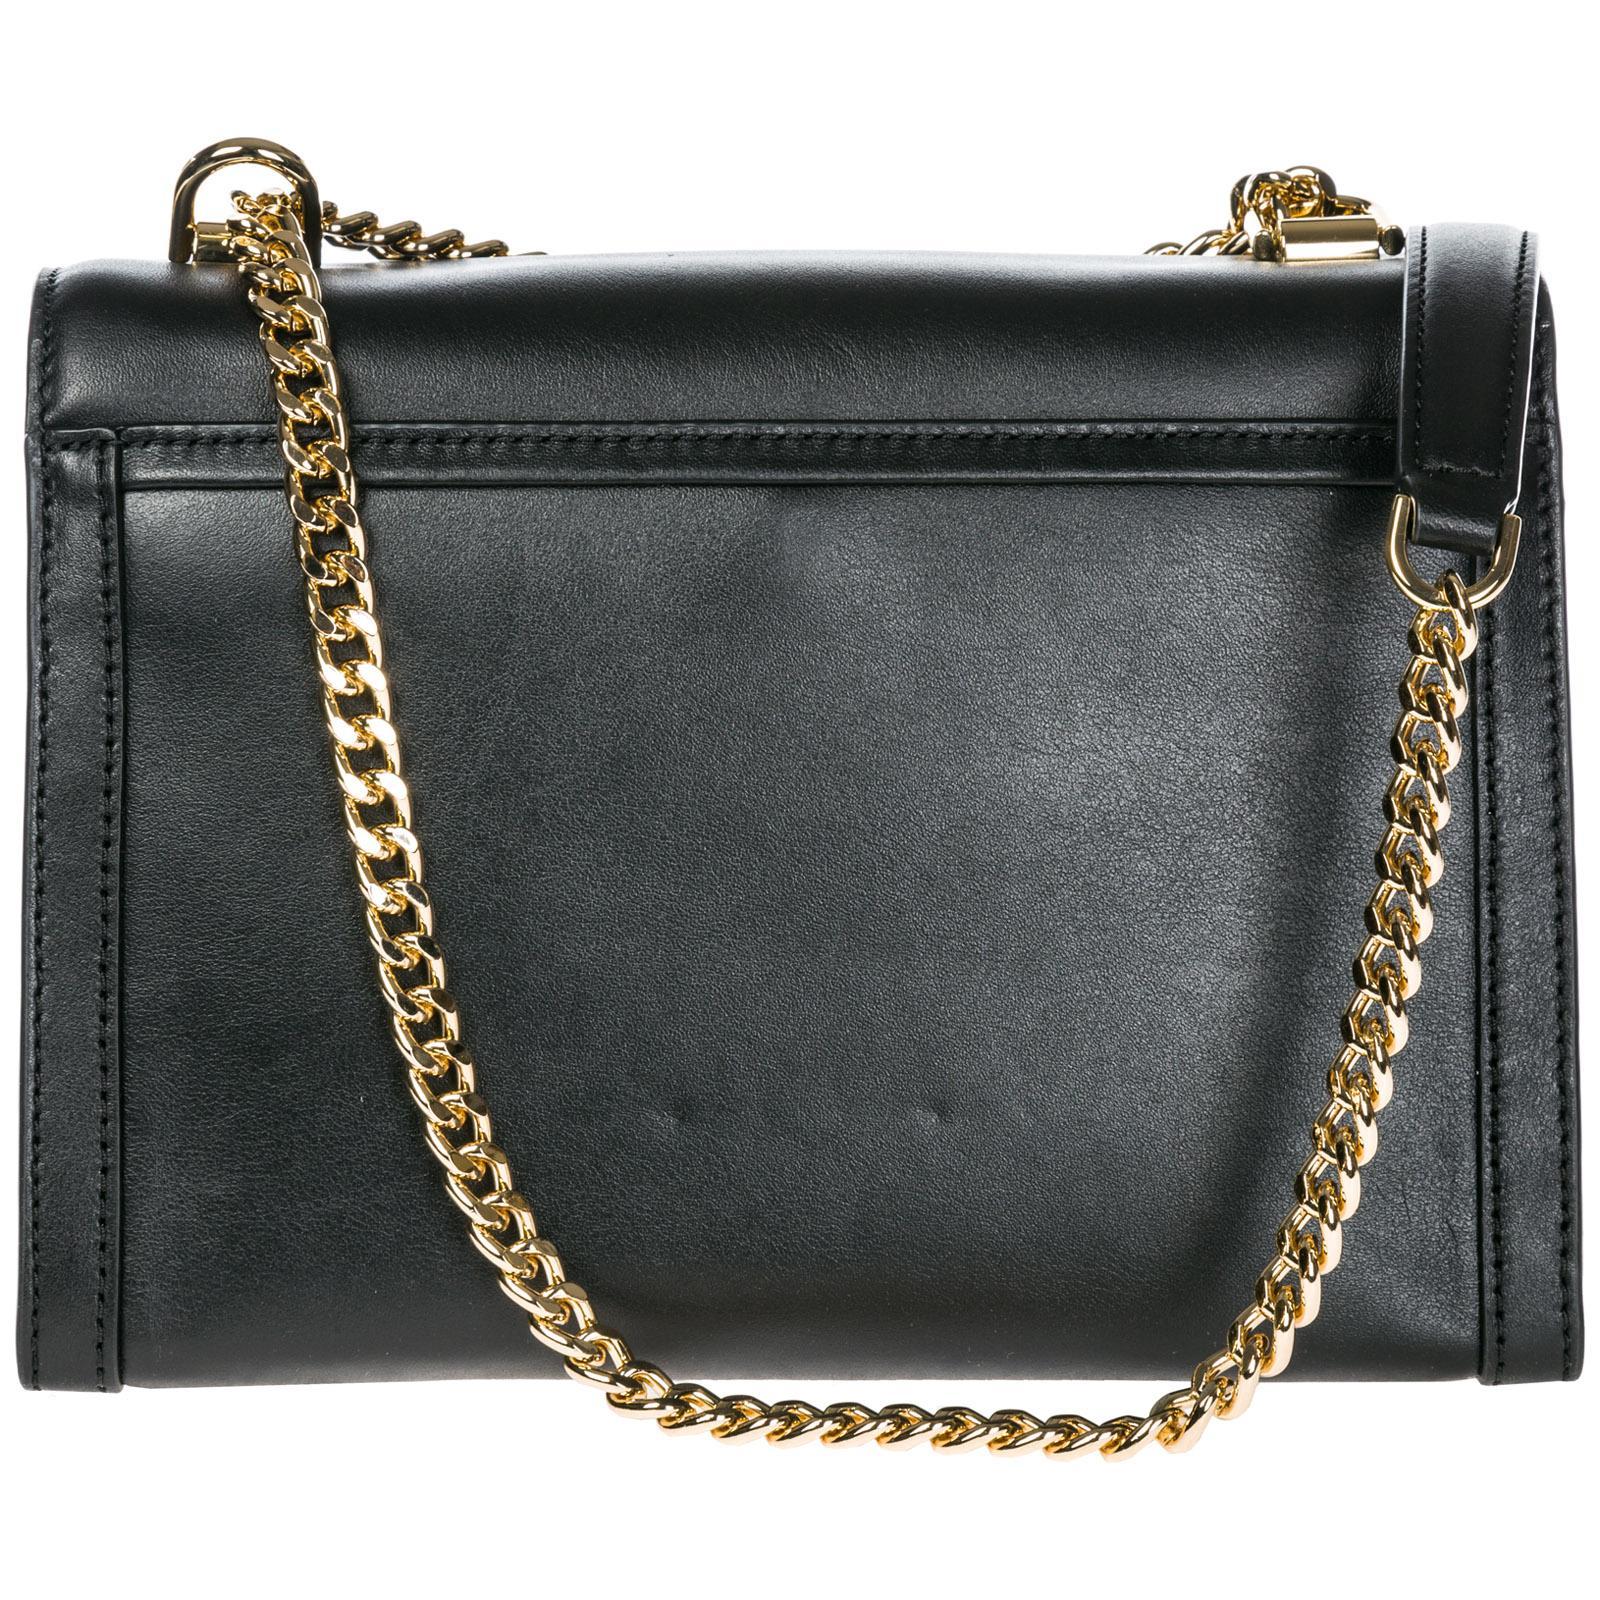 8a6f49989bb4 Michael Kors - Black Leather Shoulder Bag Whitney - Lyst. View fullscreen